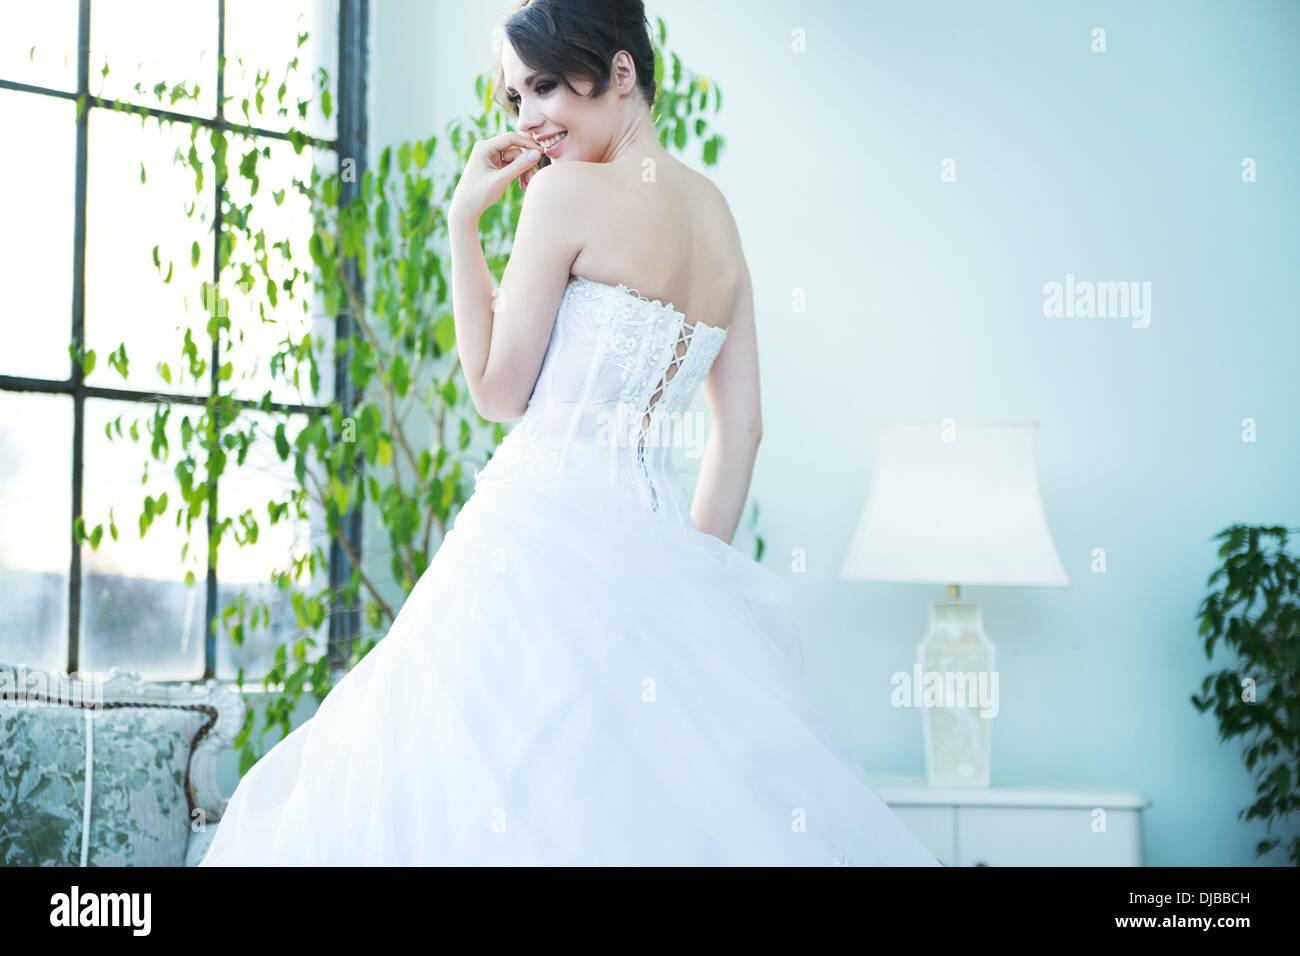 Tentadora novia esperando a su querido esposo Imagen De Stock